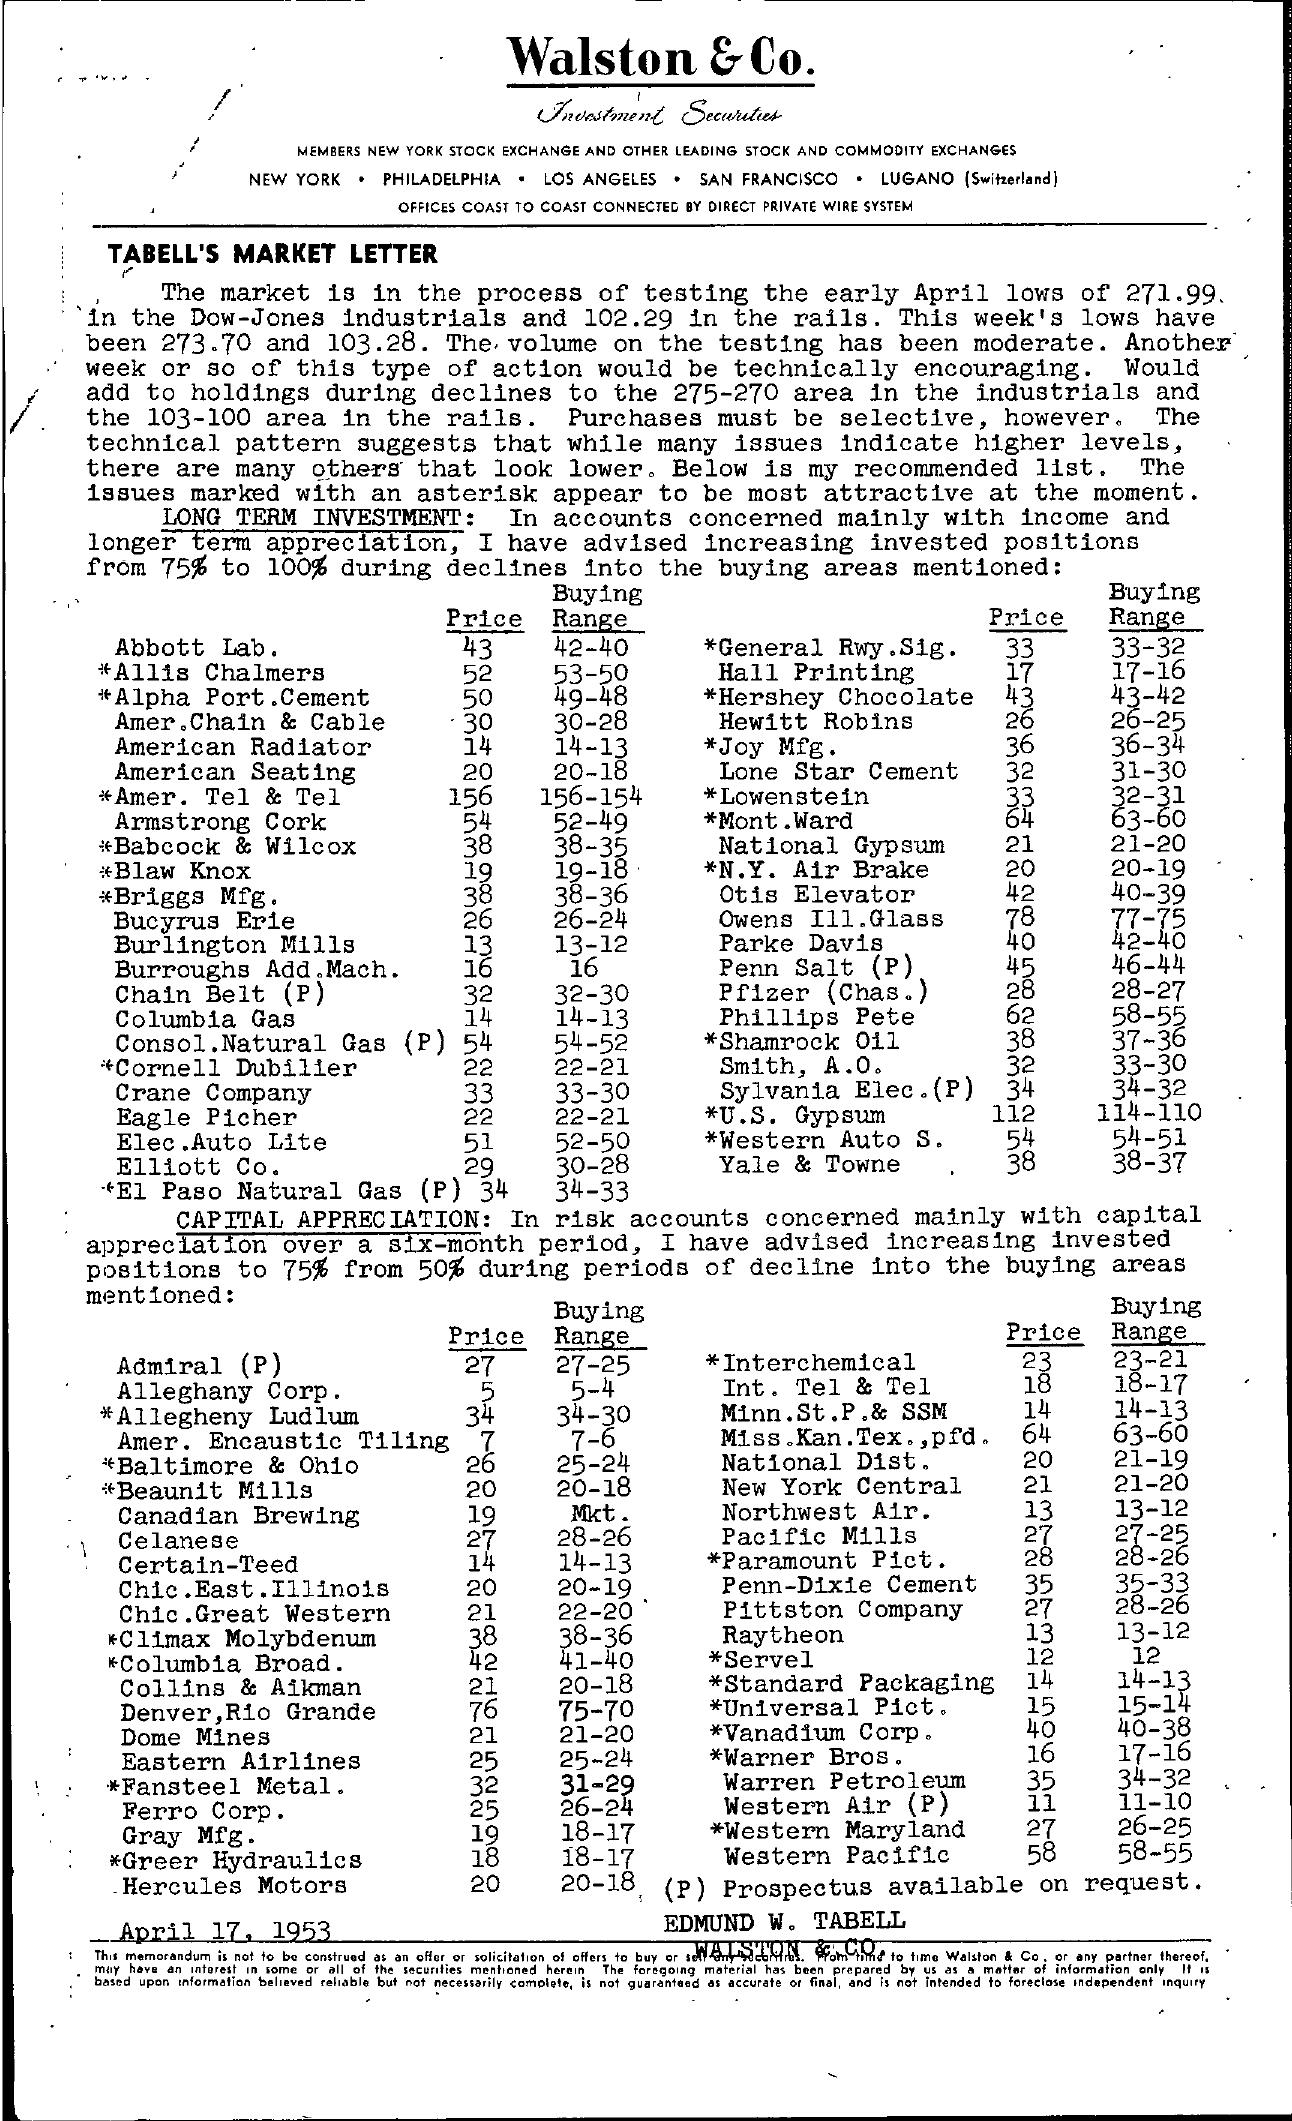 Tabell's Market Letter - April 17, 1953